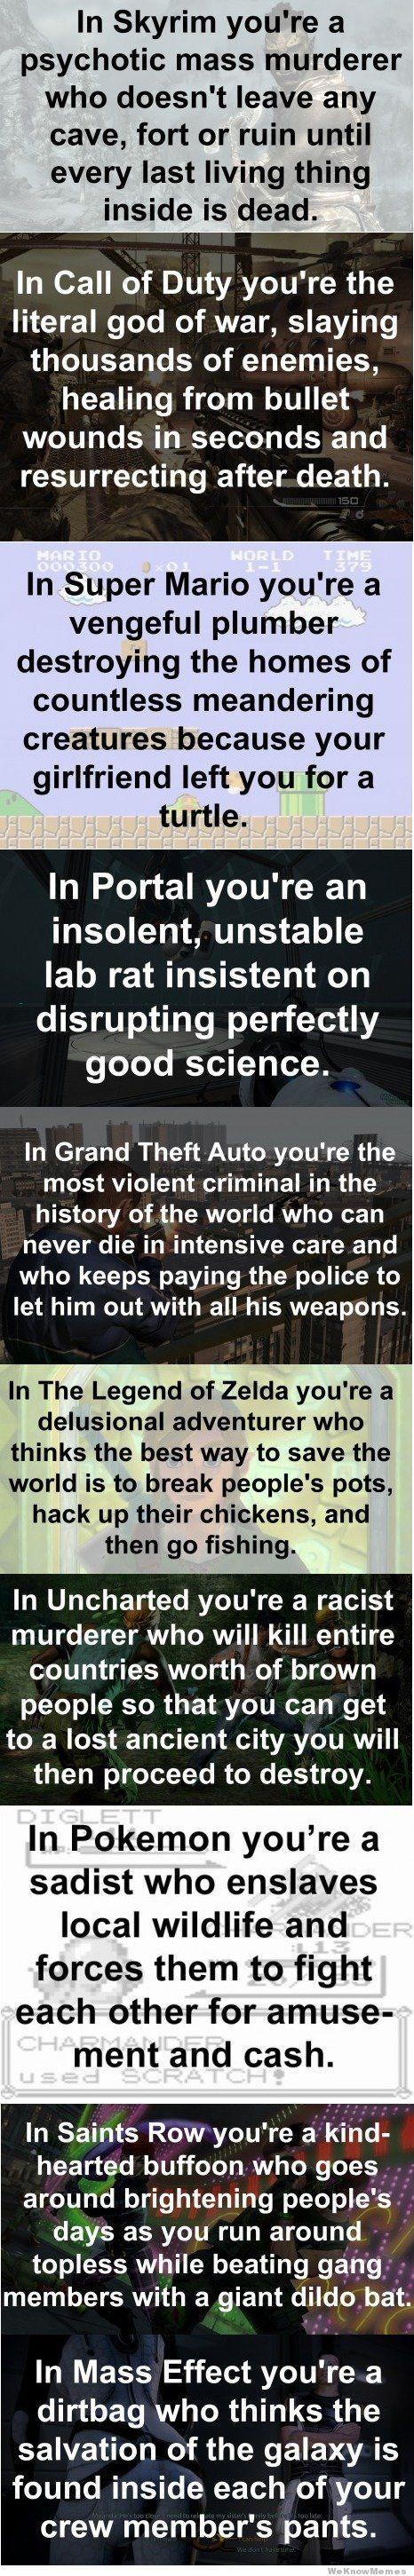 Skyrim, Saints Row, Grand Theft Auto, and Mass Effect I all played..too funny kinda true though